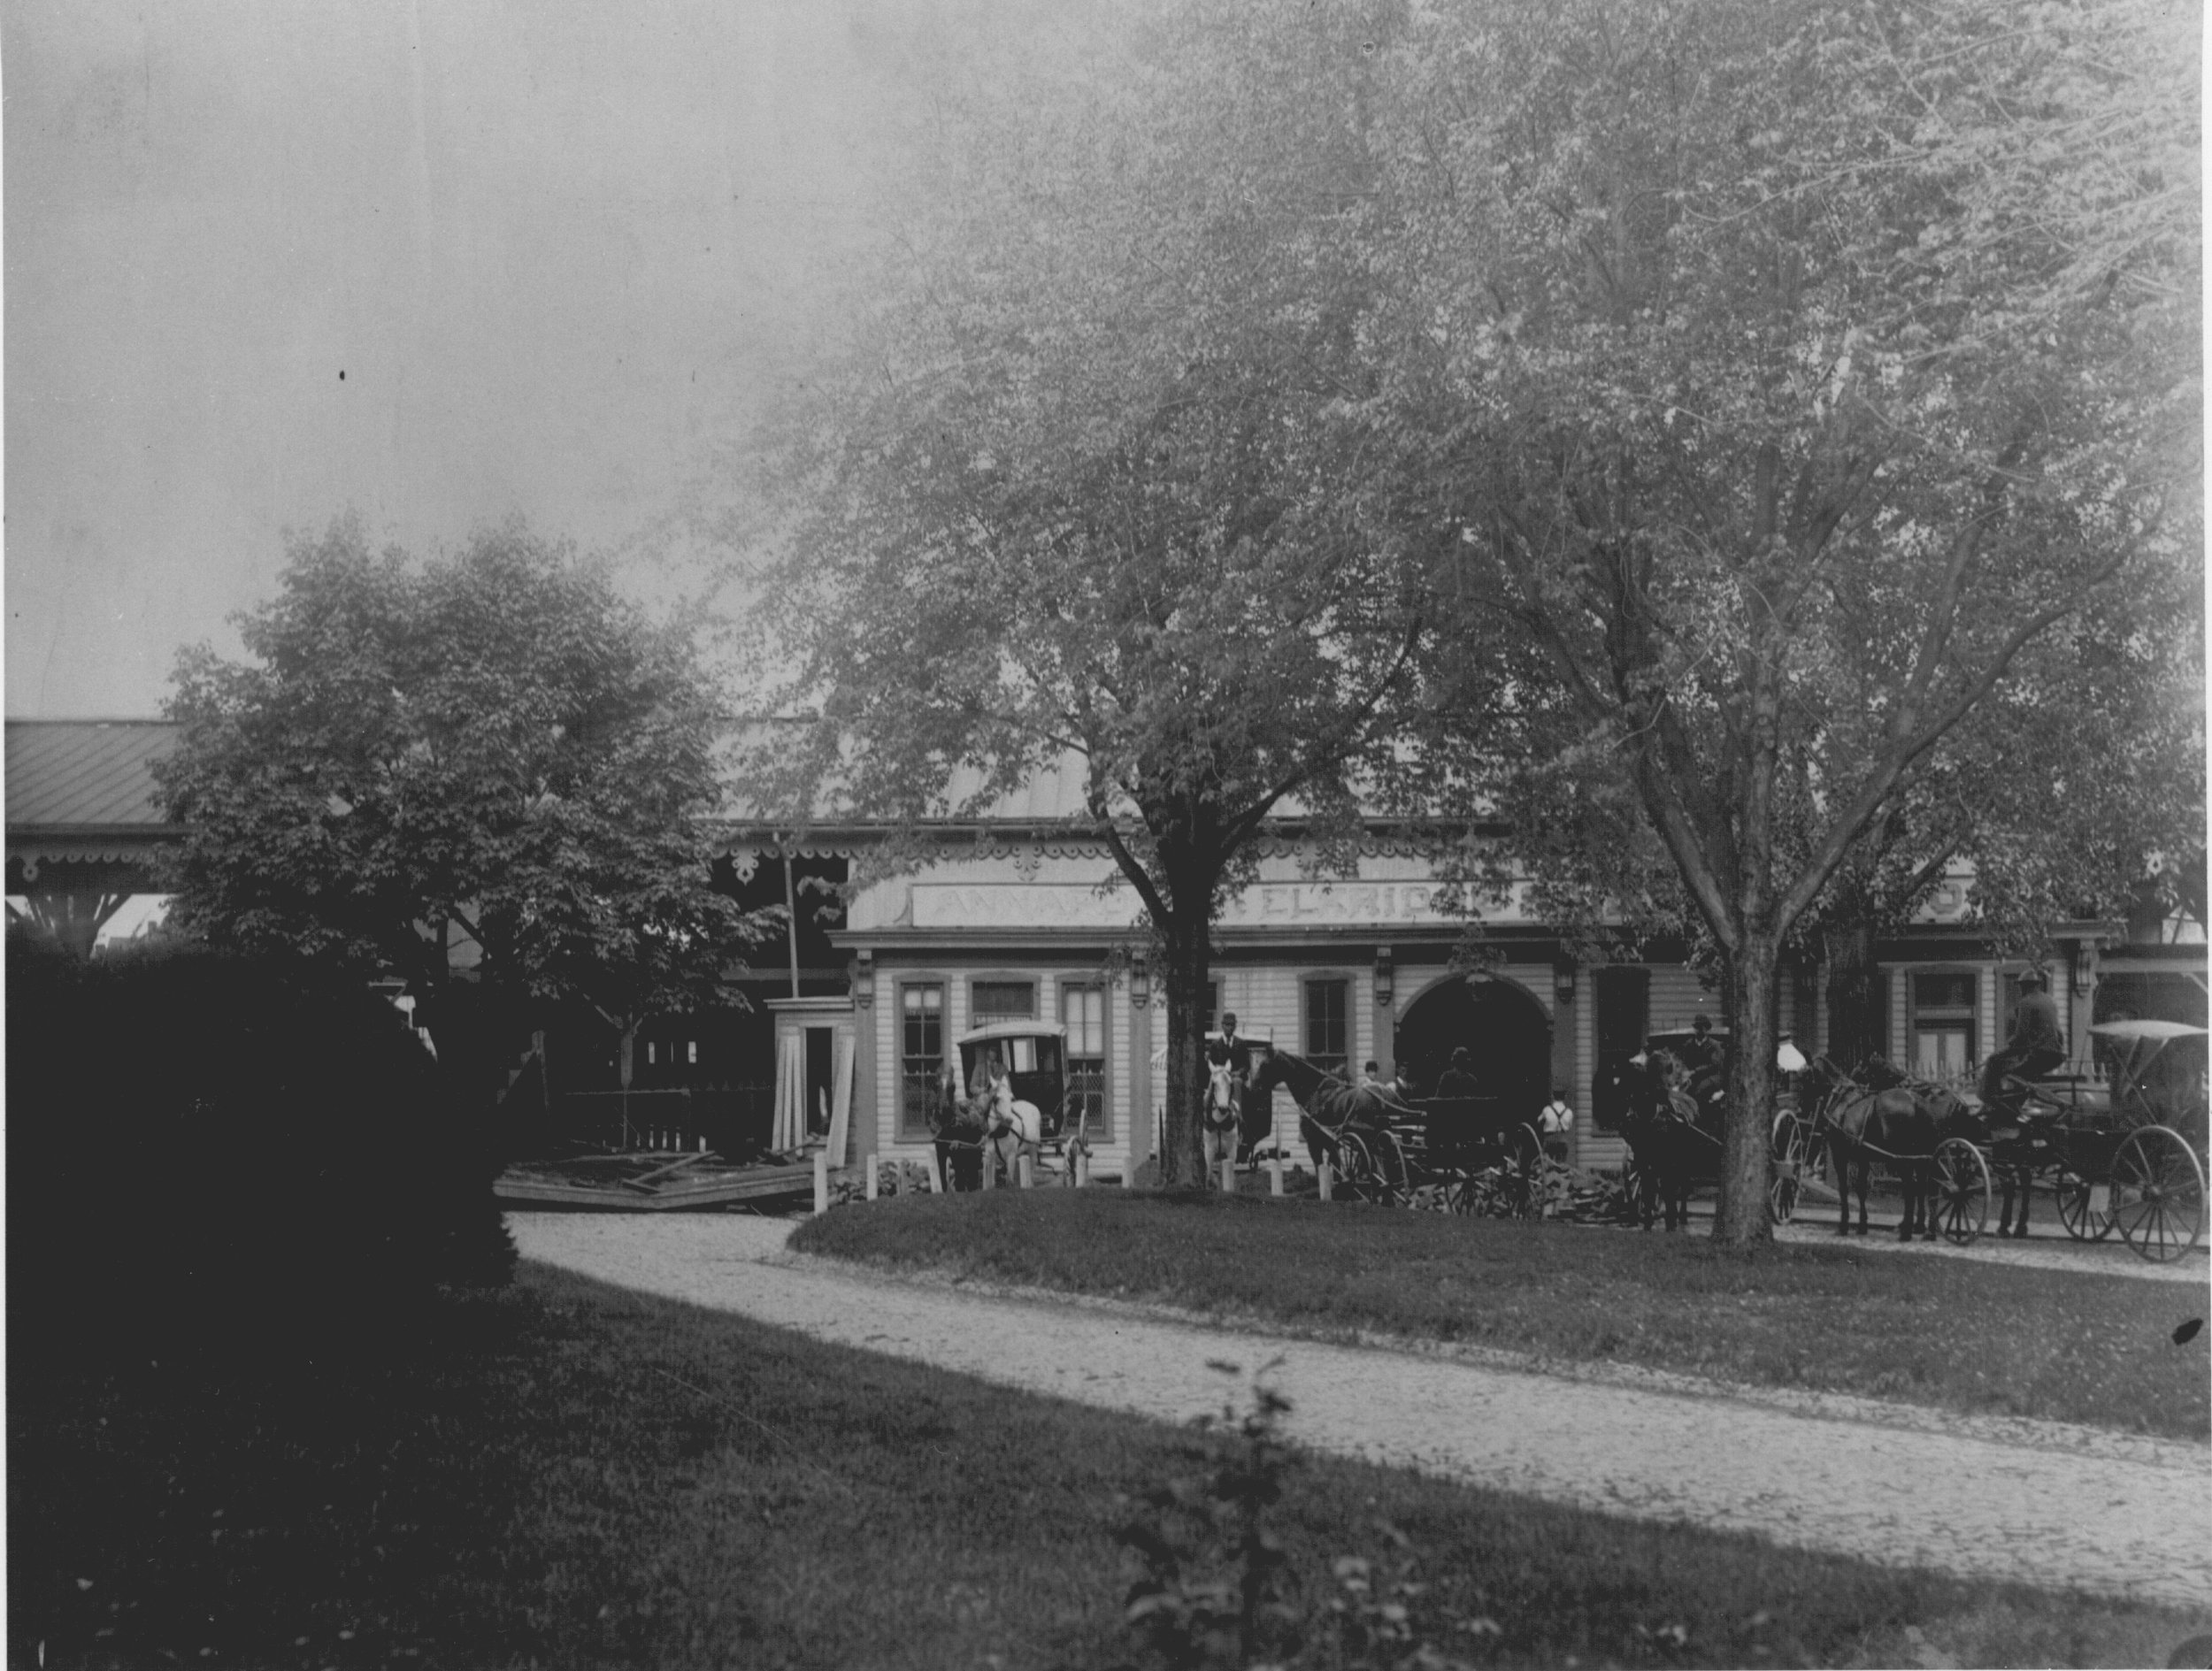 Annapolis-and-Elkridge-Railroad-Annapolis-Station - Copy.jpg